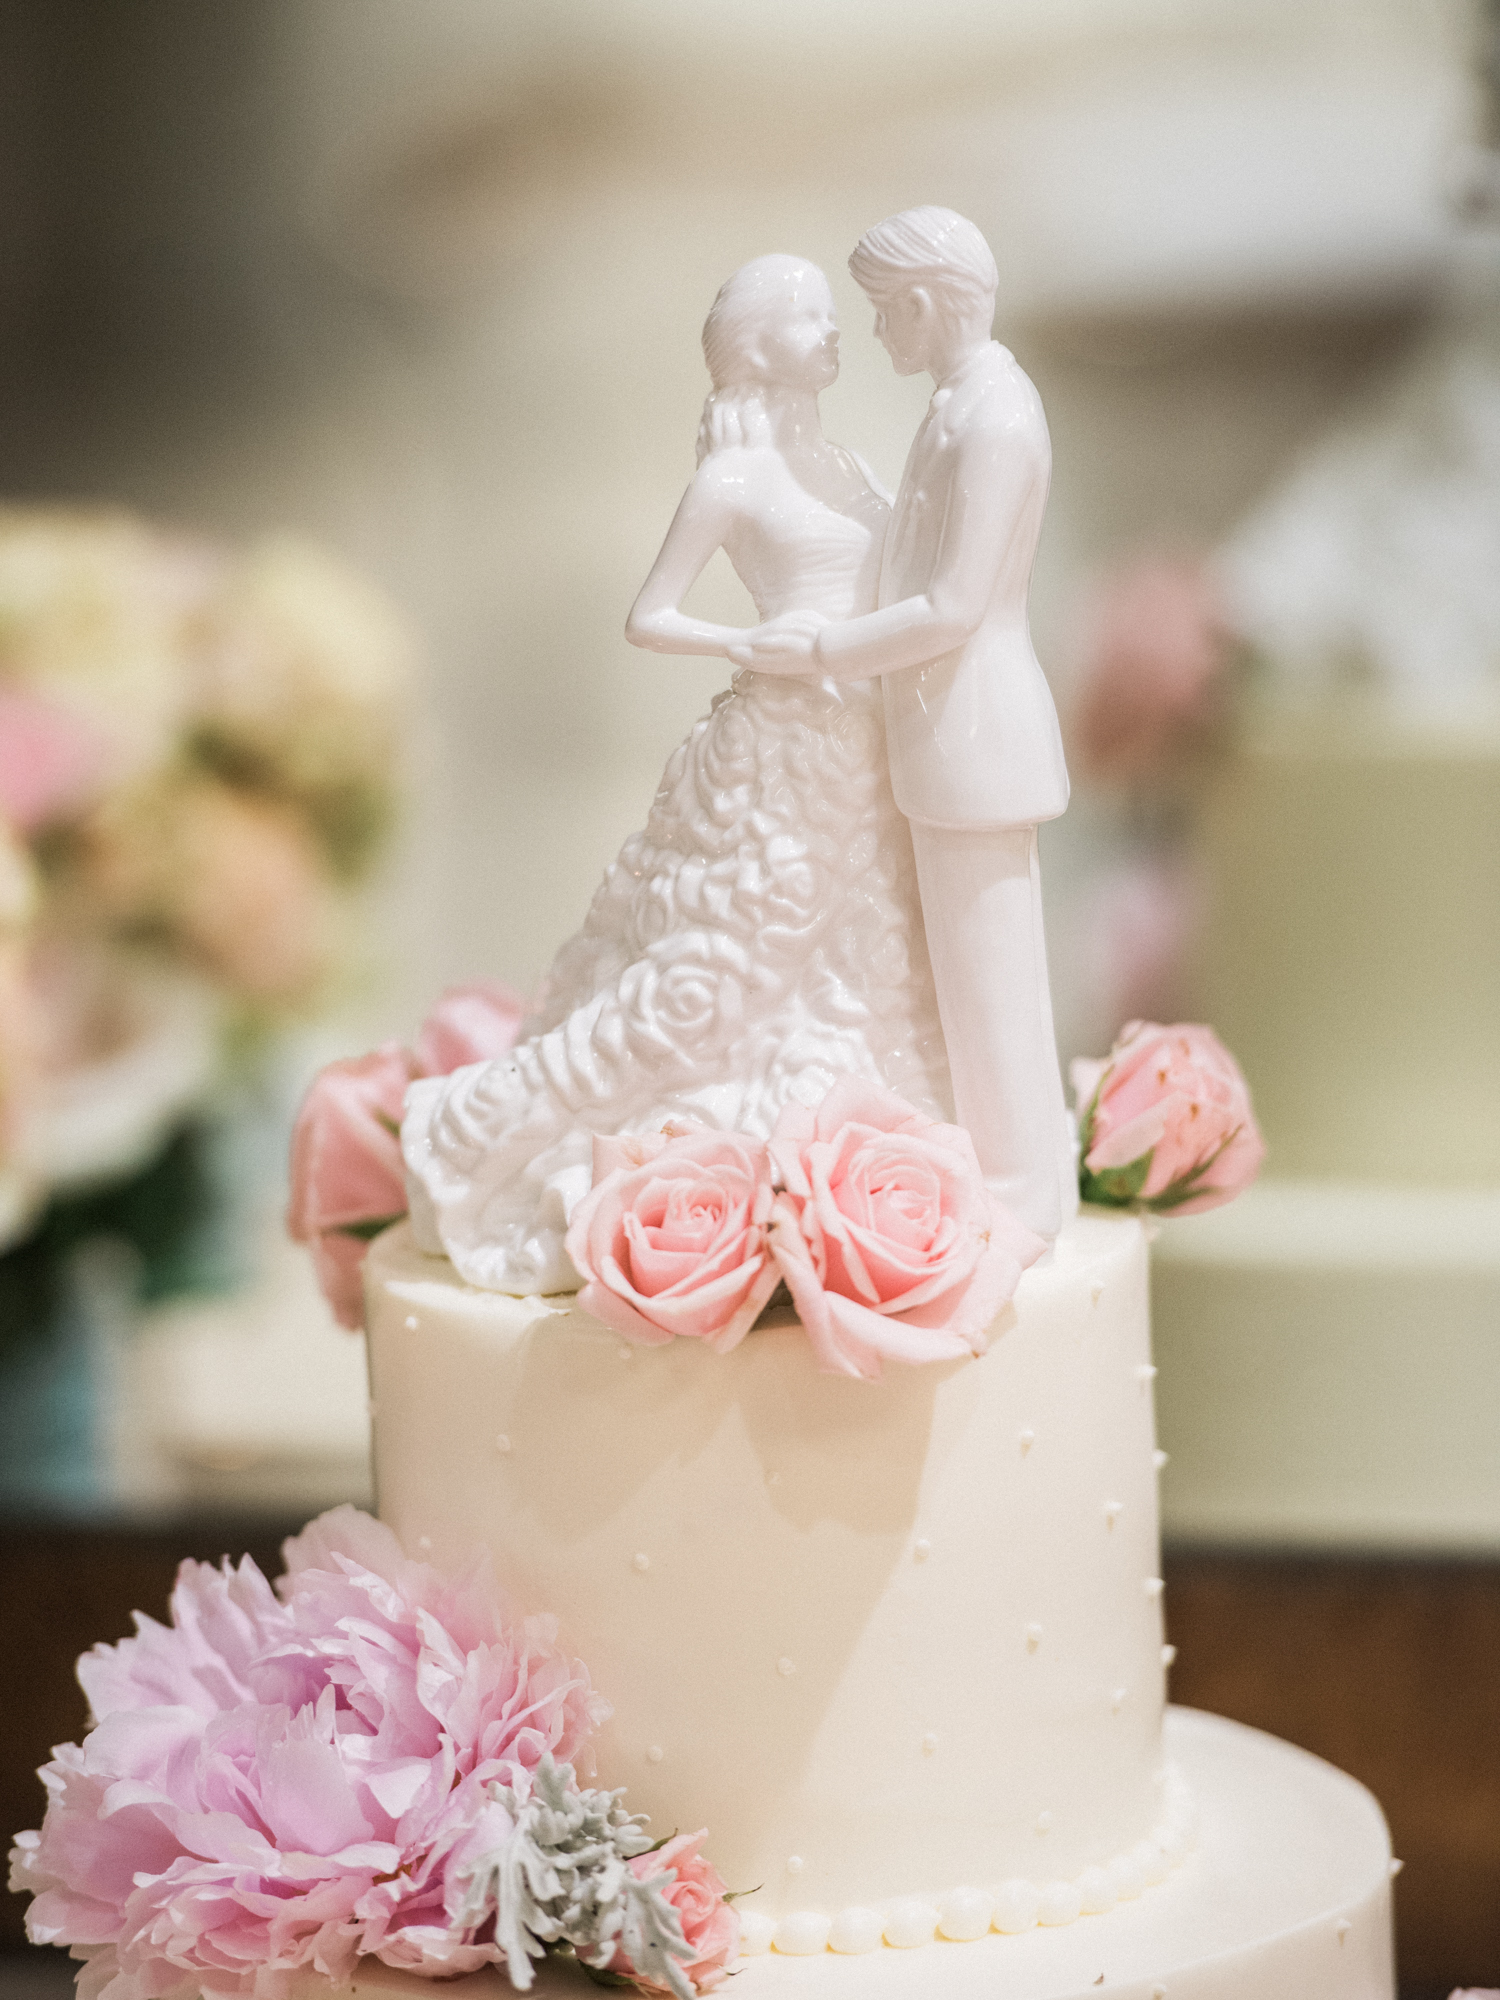 Aimee+Logan_wedding_spp-134.jpg